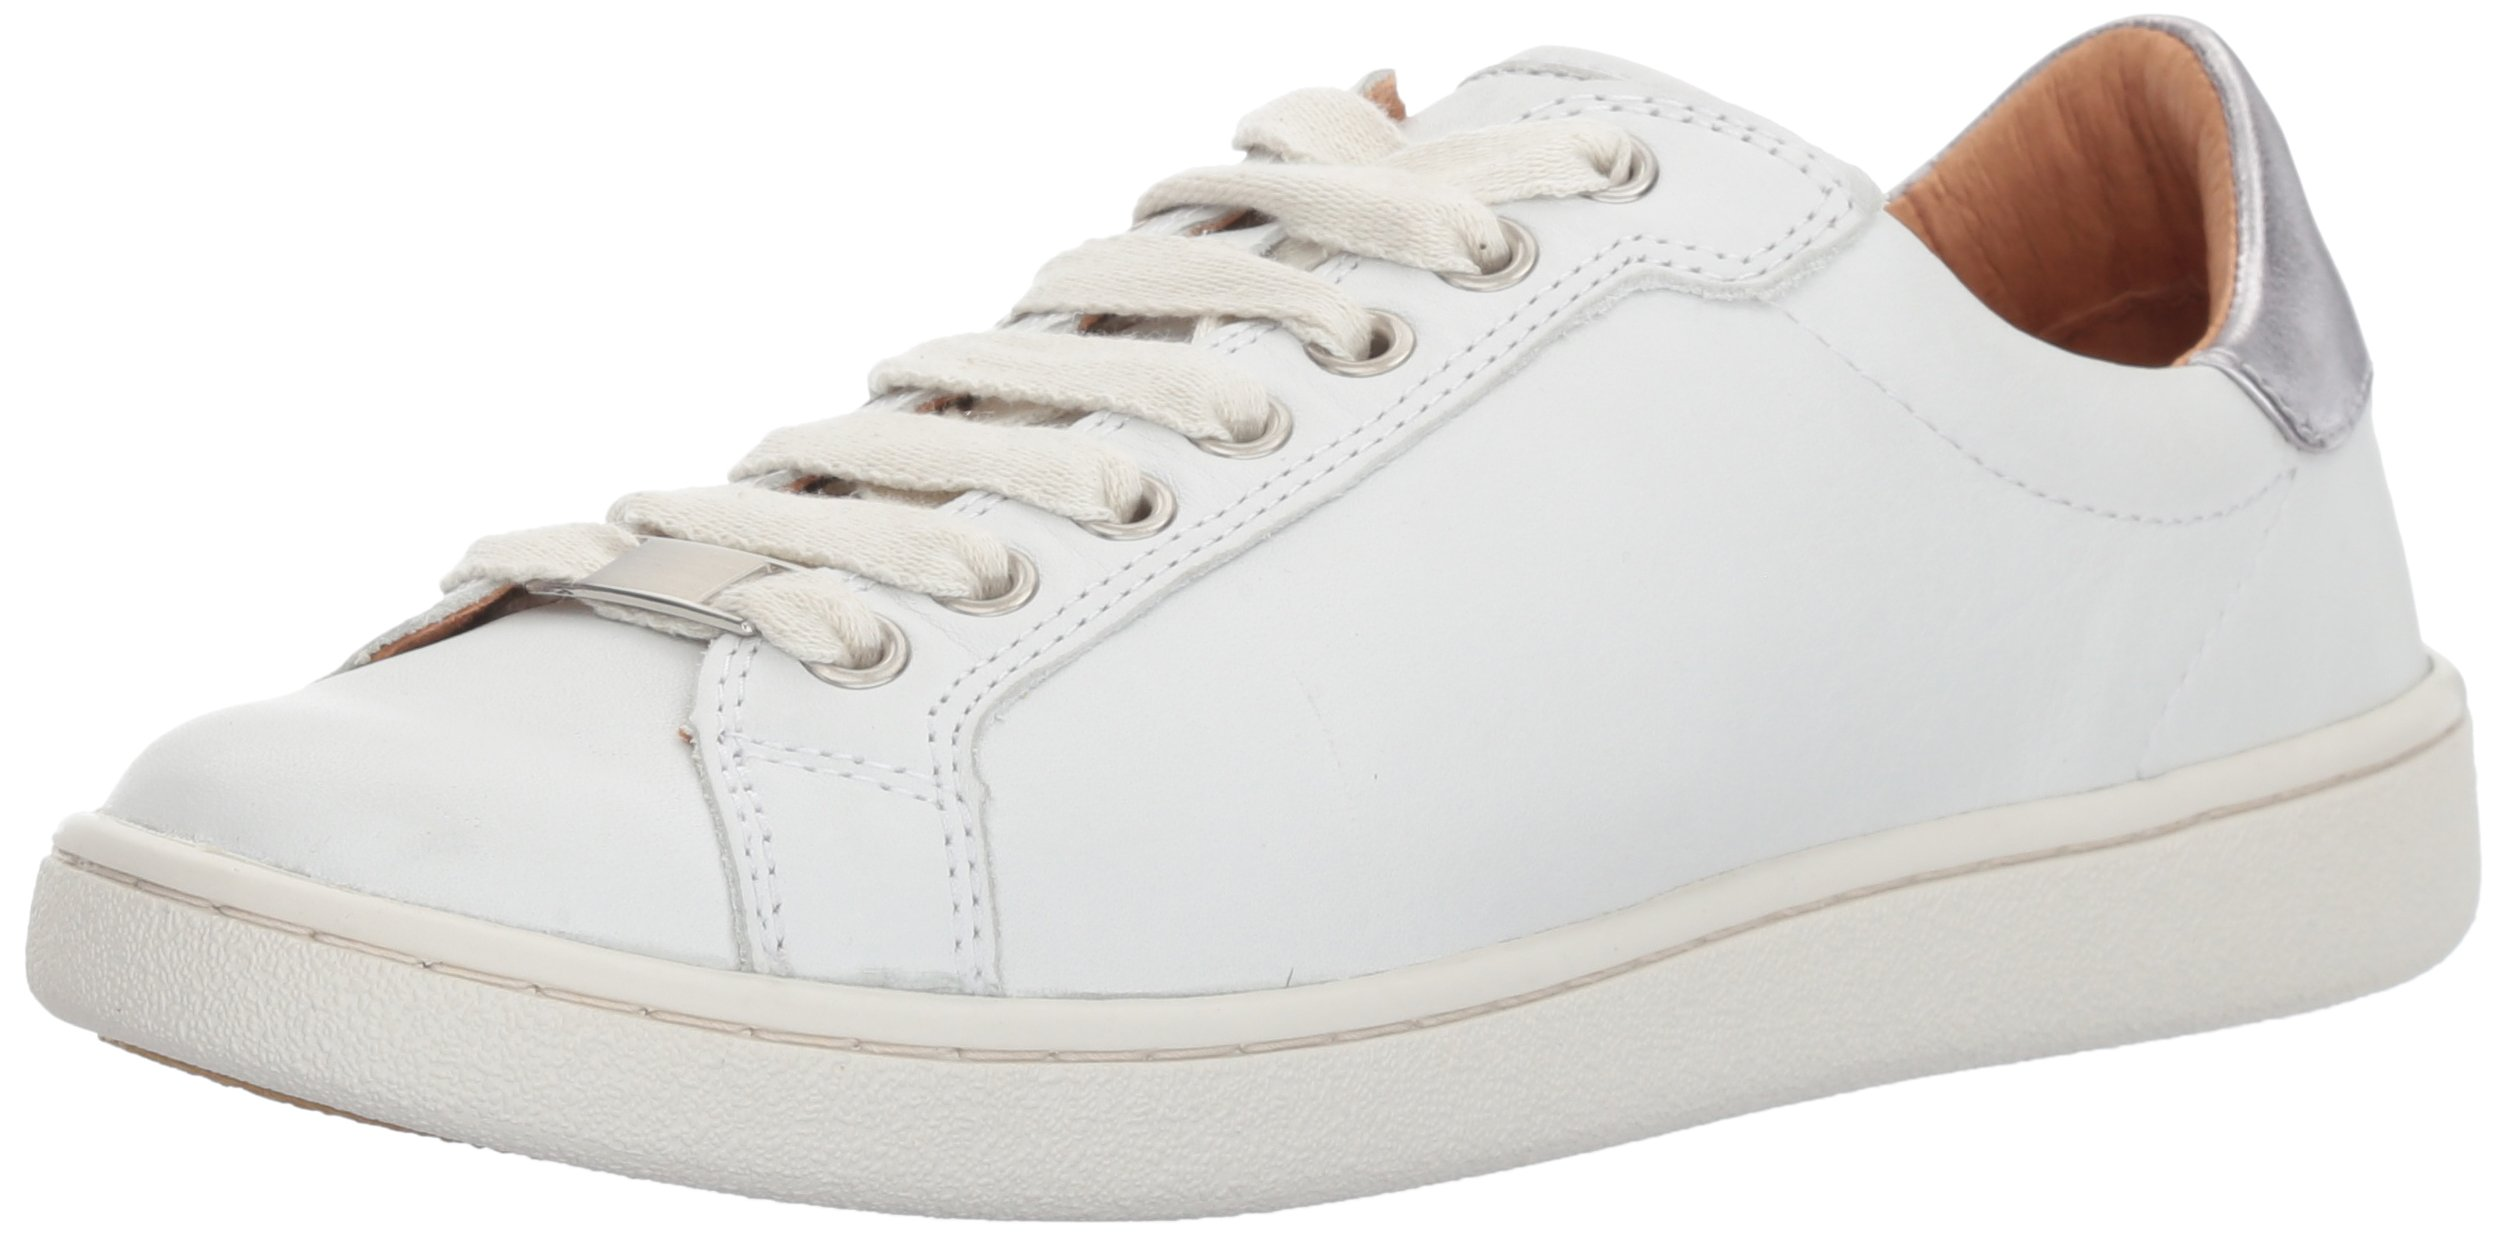 UGG Women's Milo Shoe White Size 7.5 B(M) US